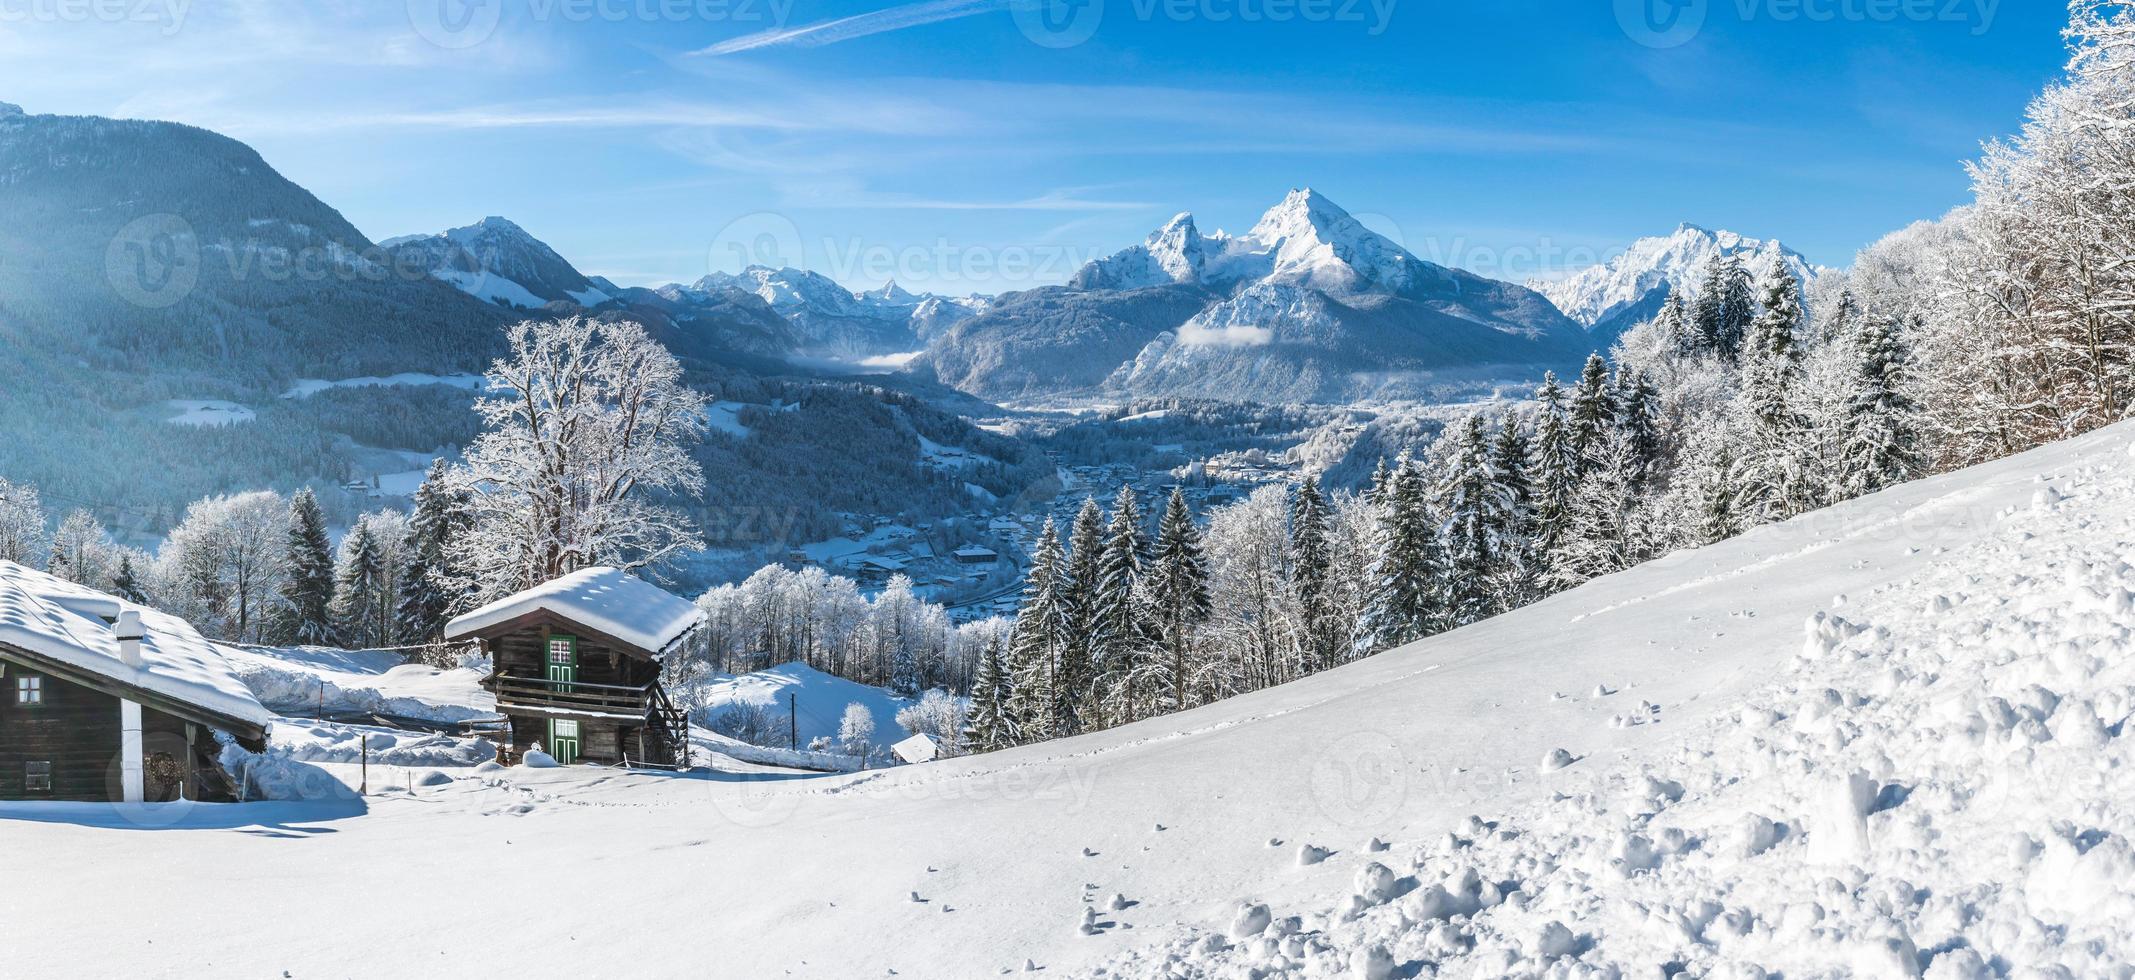 Idyllic landscape in the Bavarian Alps, Berchtesgaden, Germany photo